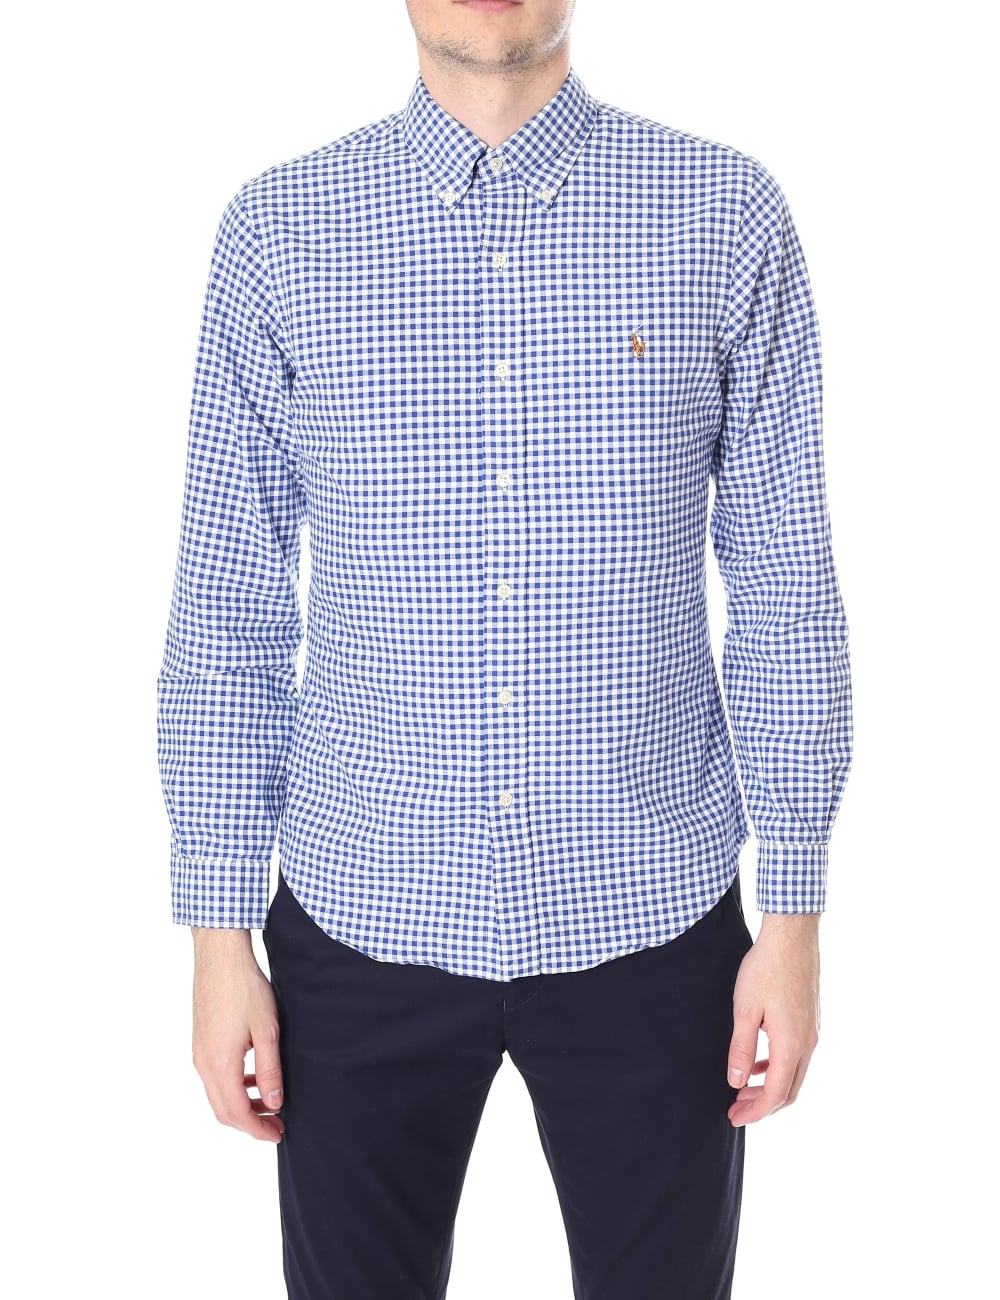 b12cbecba8 Polo Ralph Lauren Men's Slim Fit Check Long Sleeve Shirt